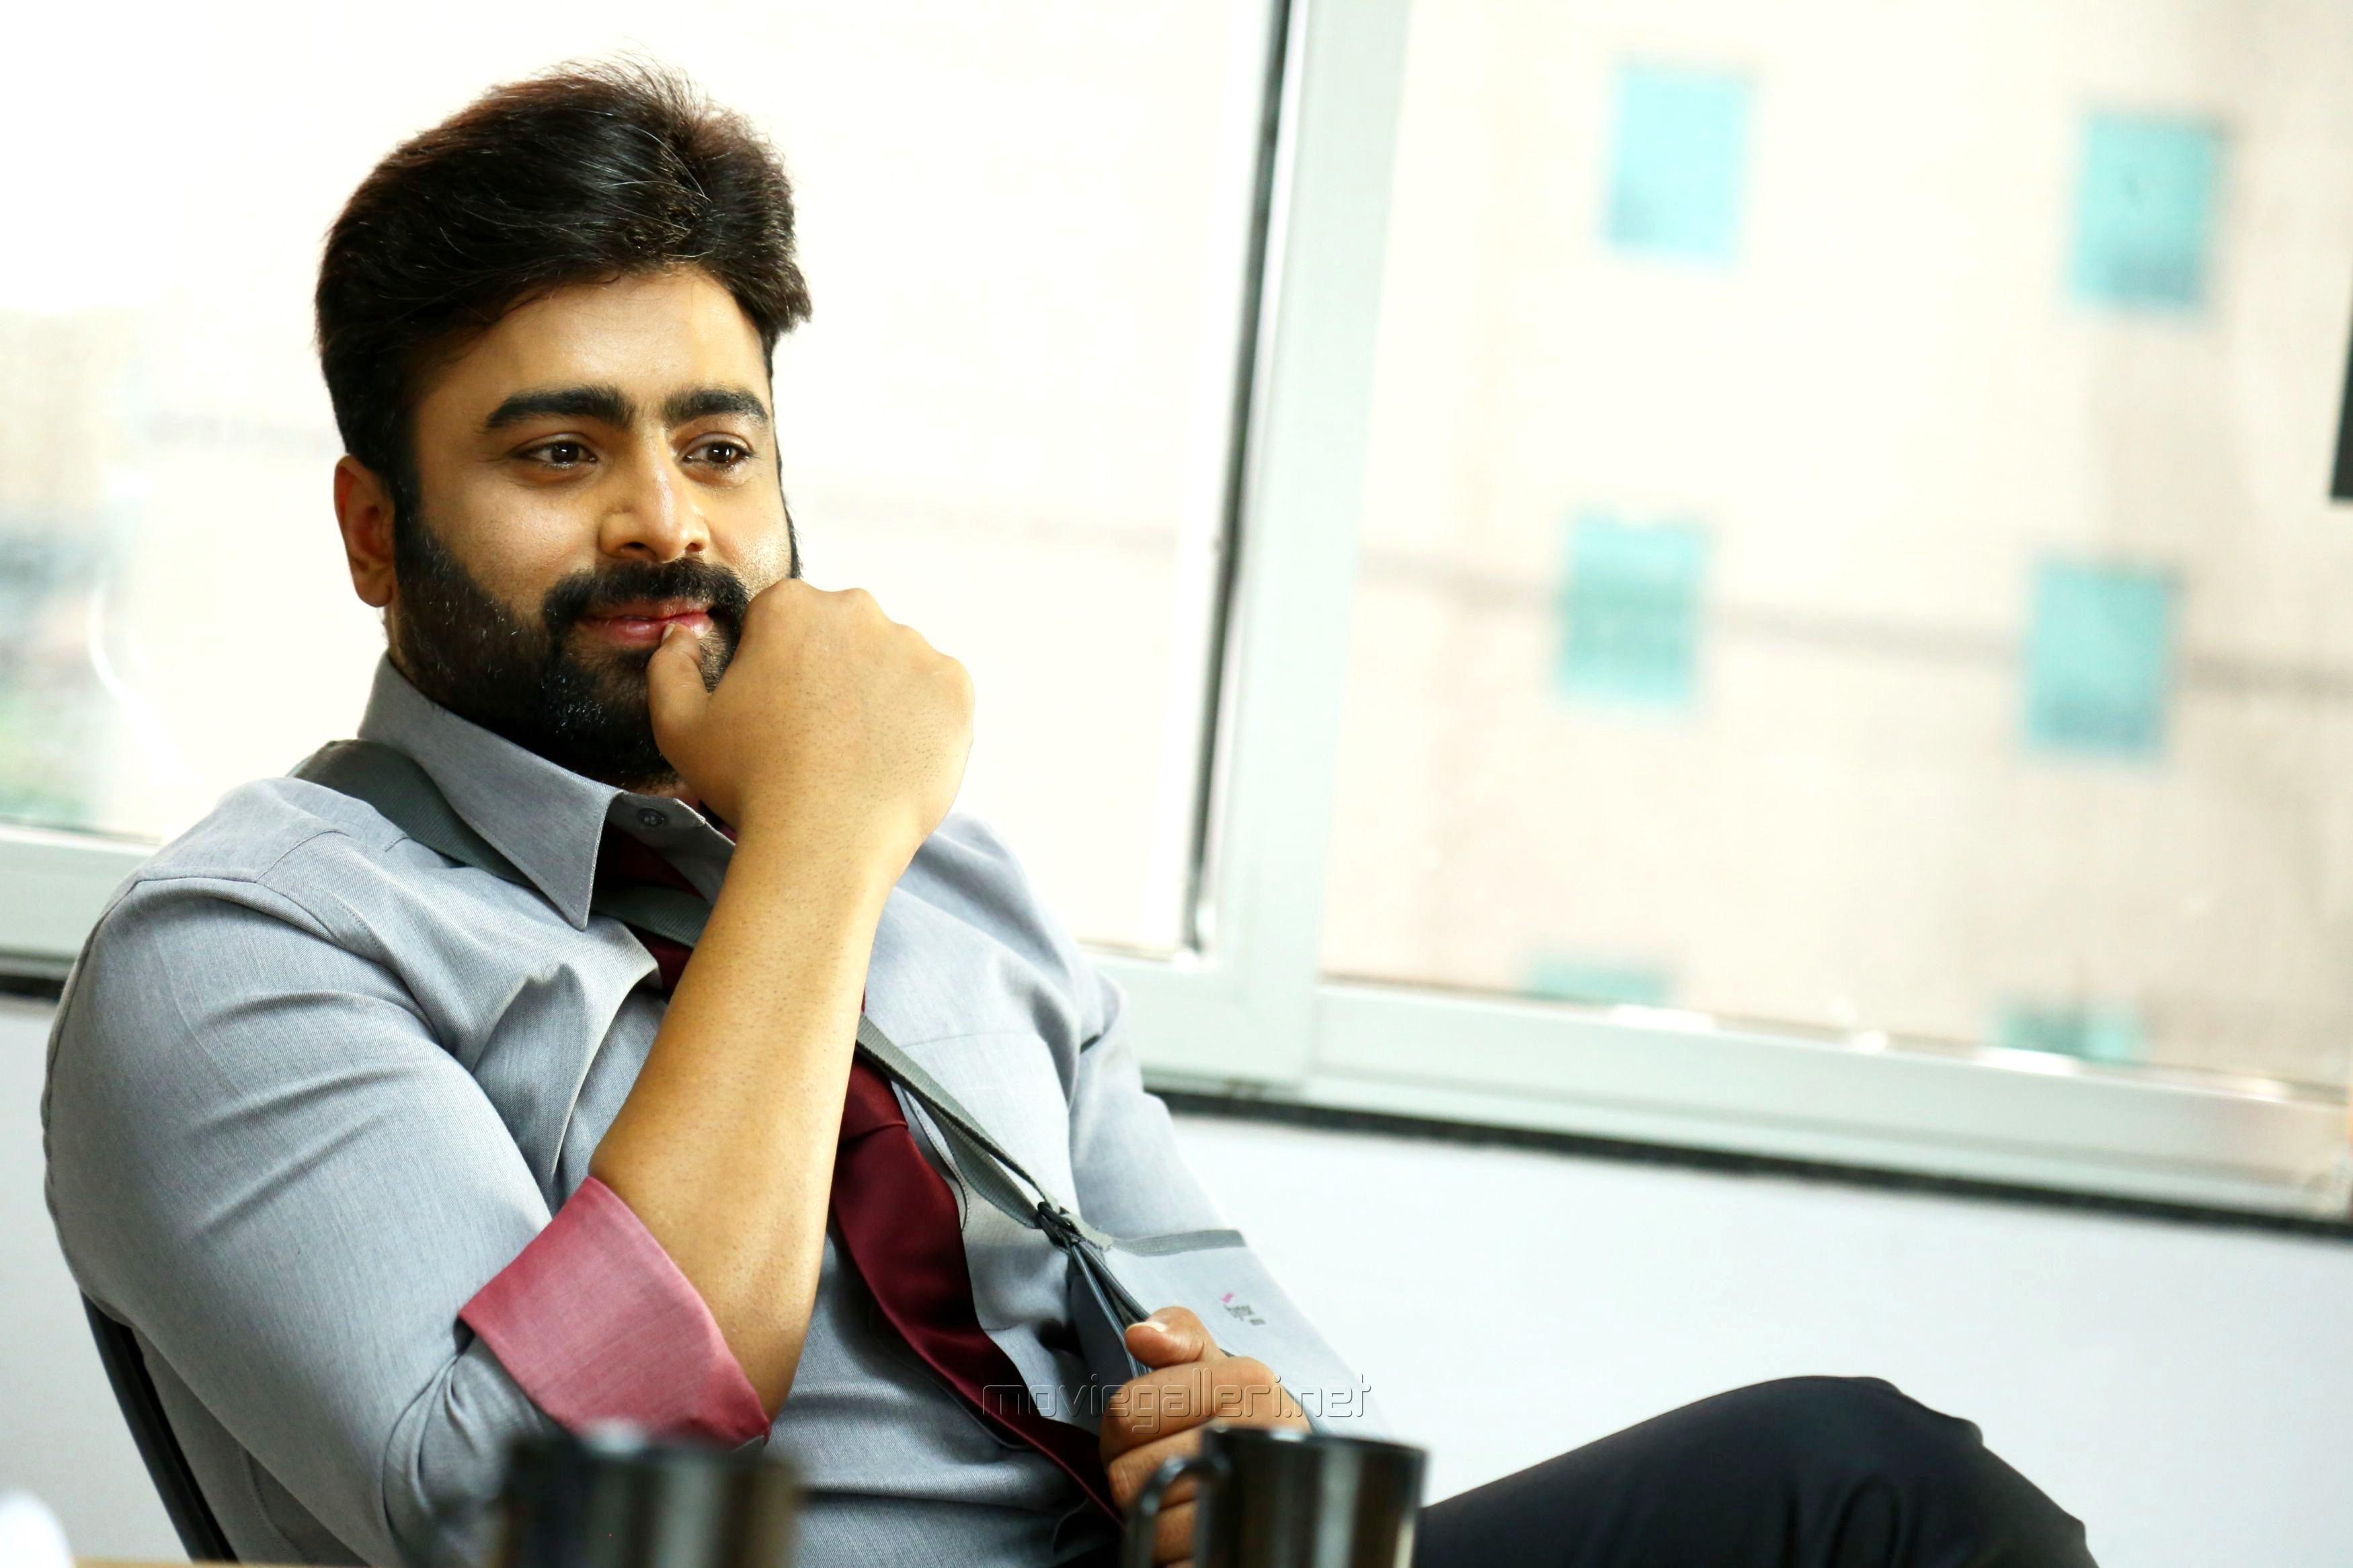 Veera Bhoga Vasantha Rayalu Movie Nara Raohit Pics HD